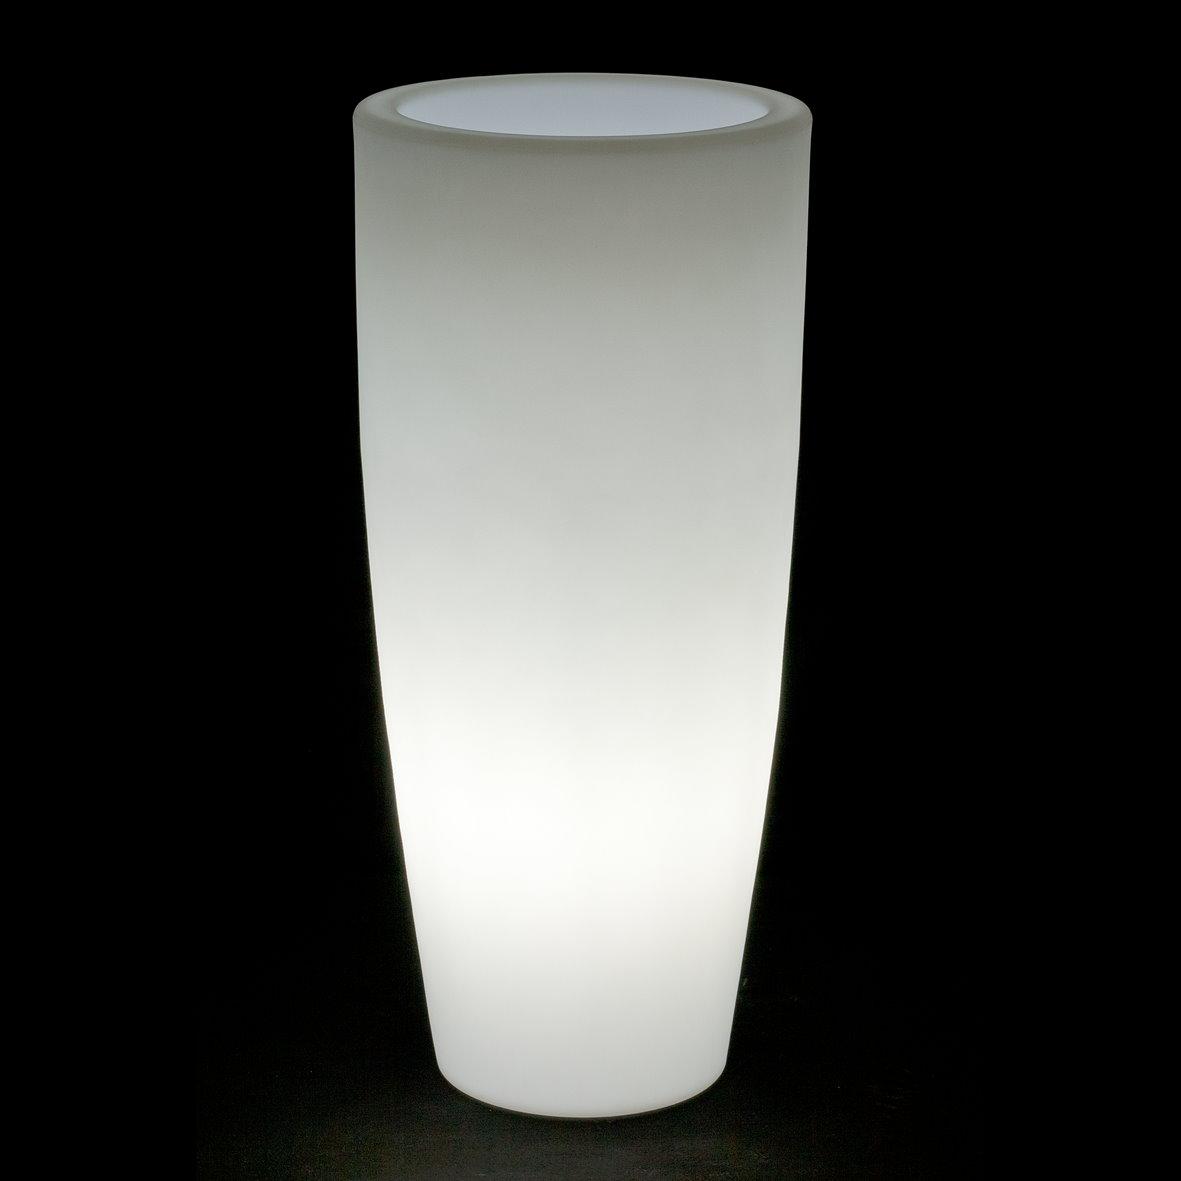 LED Leuchtopf Blumentopf beleuchtet Bambu Light  40 cm Hhe 895 cm wei mit Akku und